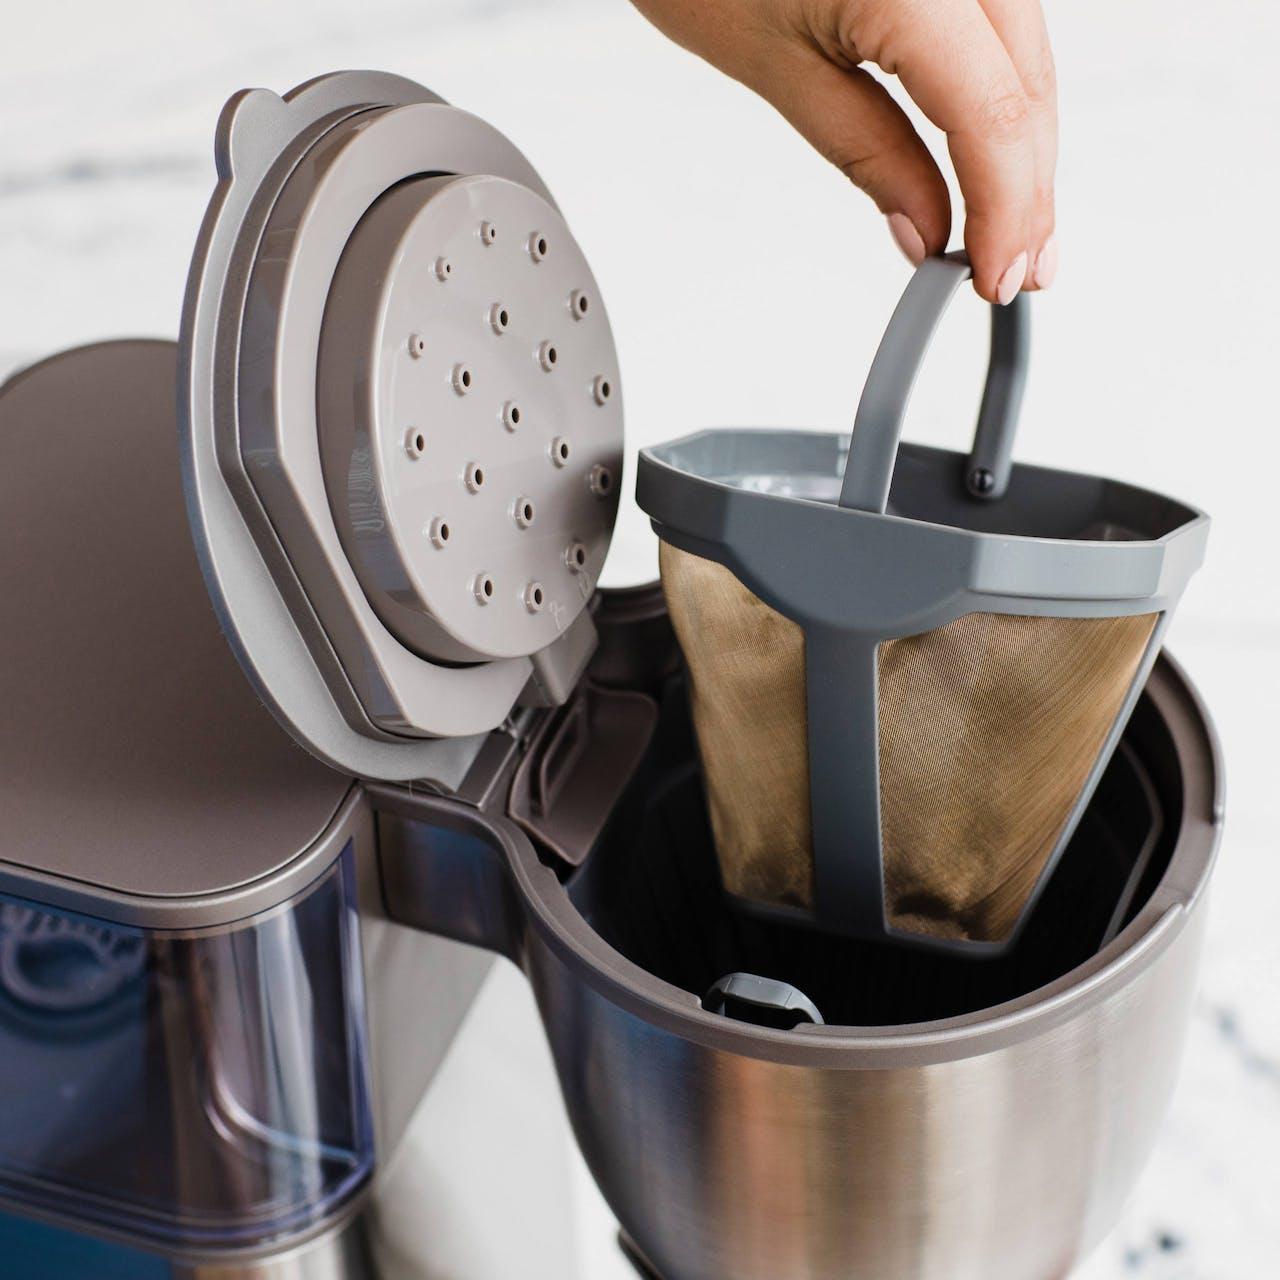 reusable gold mesh filter for café coffee maker